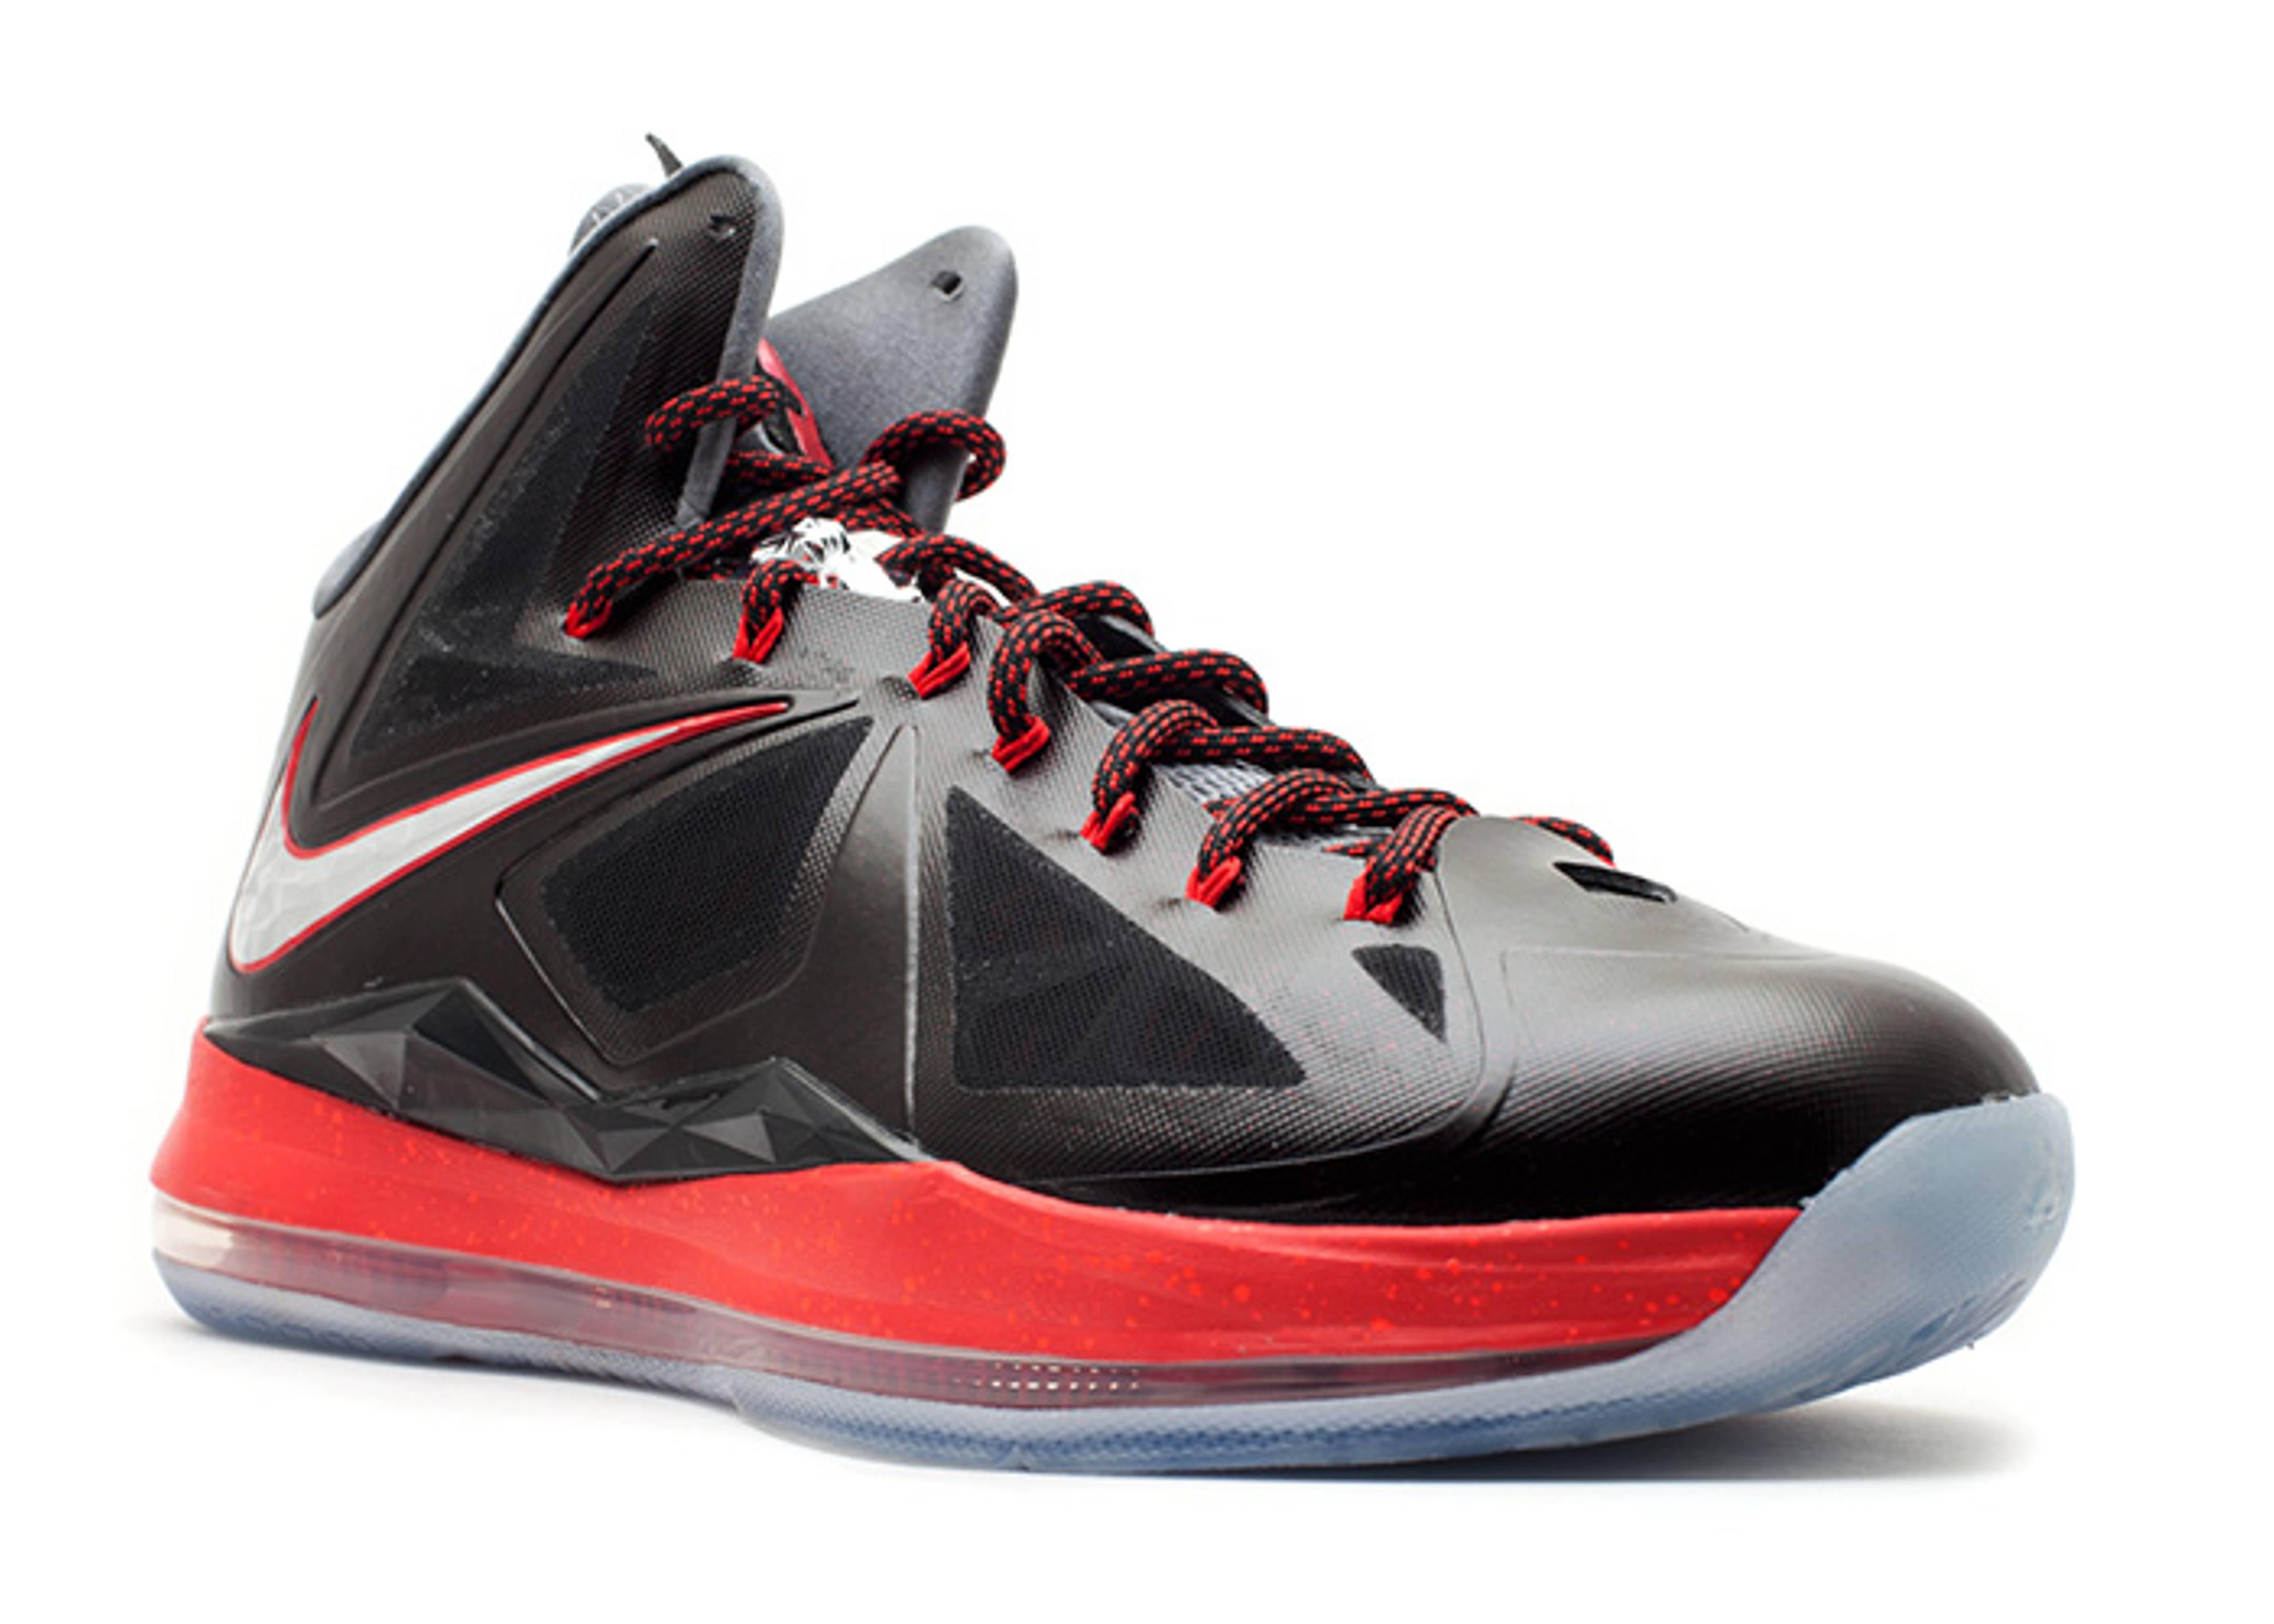 new product fc760 bd147 ... 1 lebron 10 pressure New Nike ...